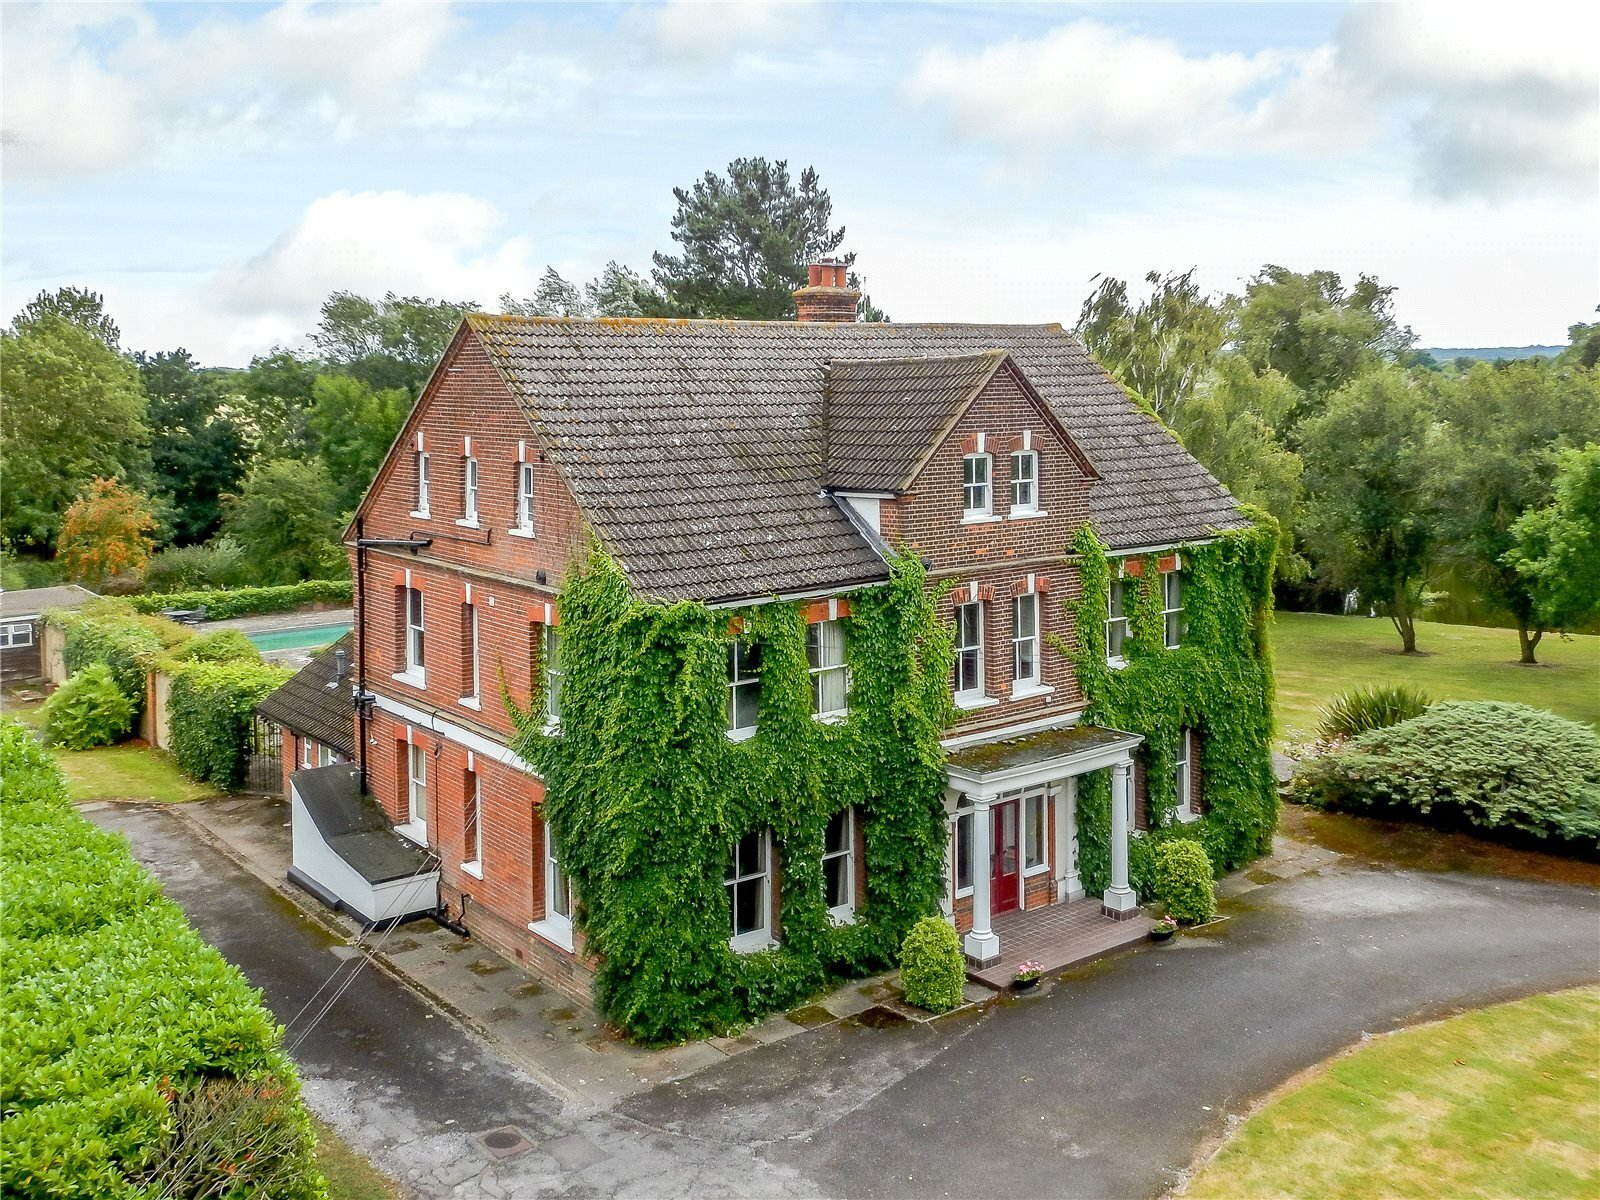 House in Wickford, England, United Kingdom 1